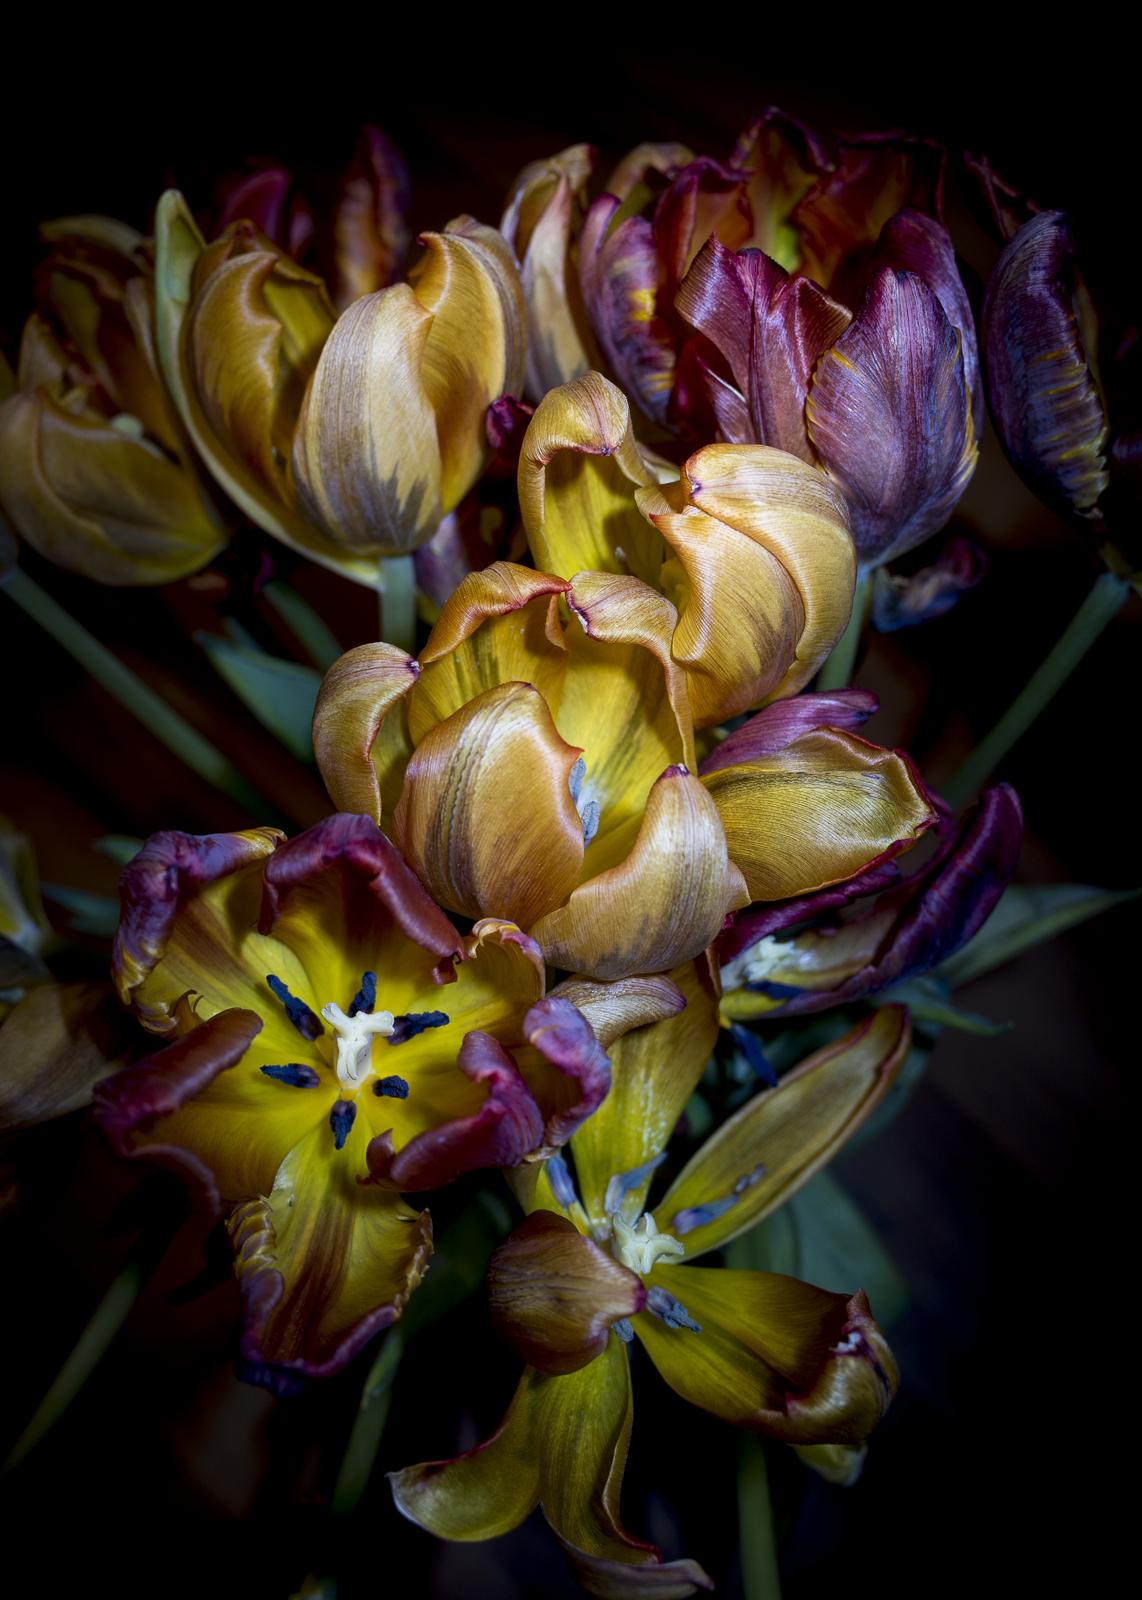 Tulips, I